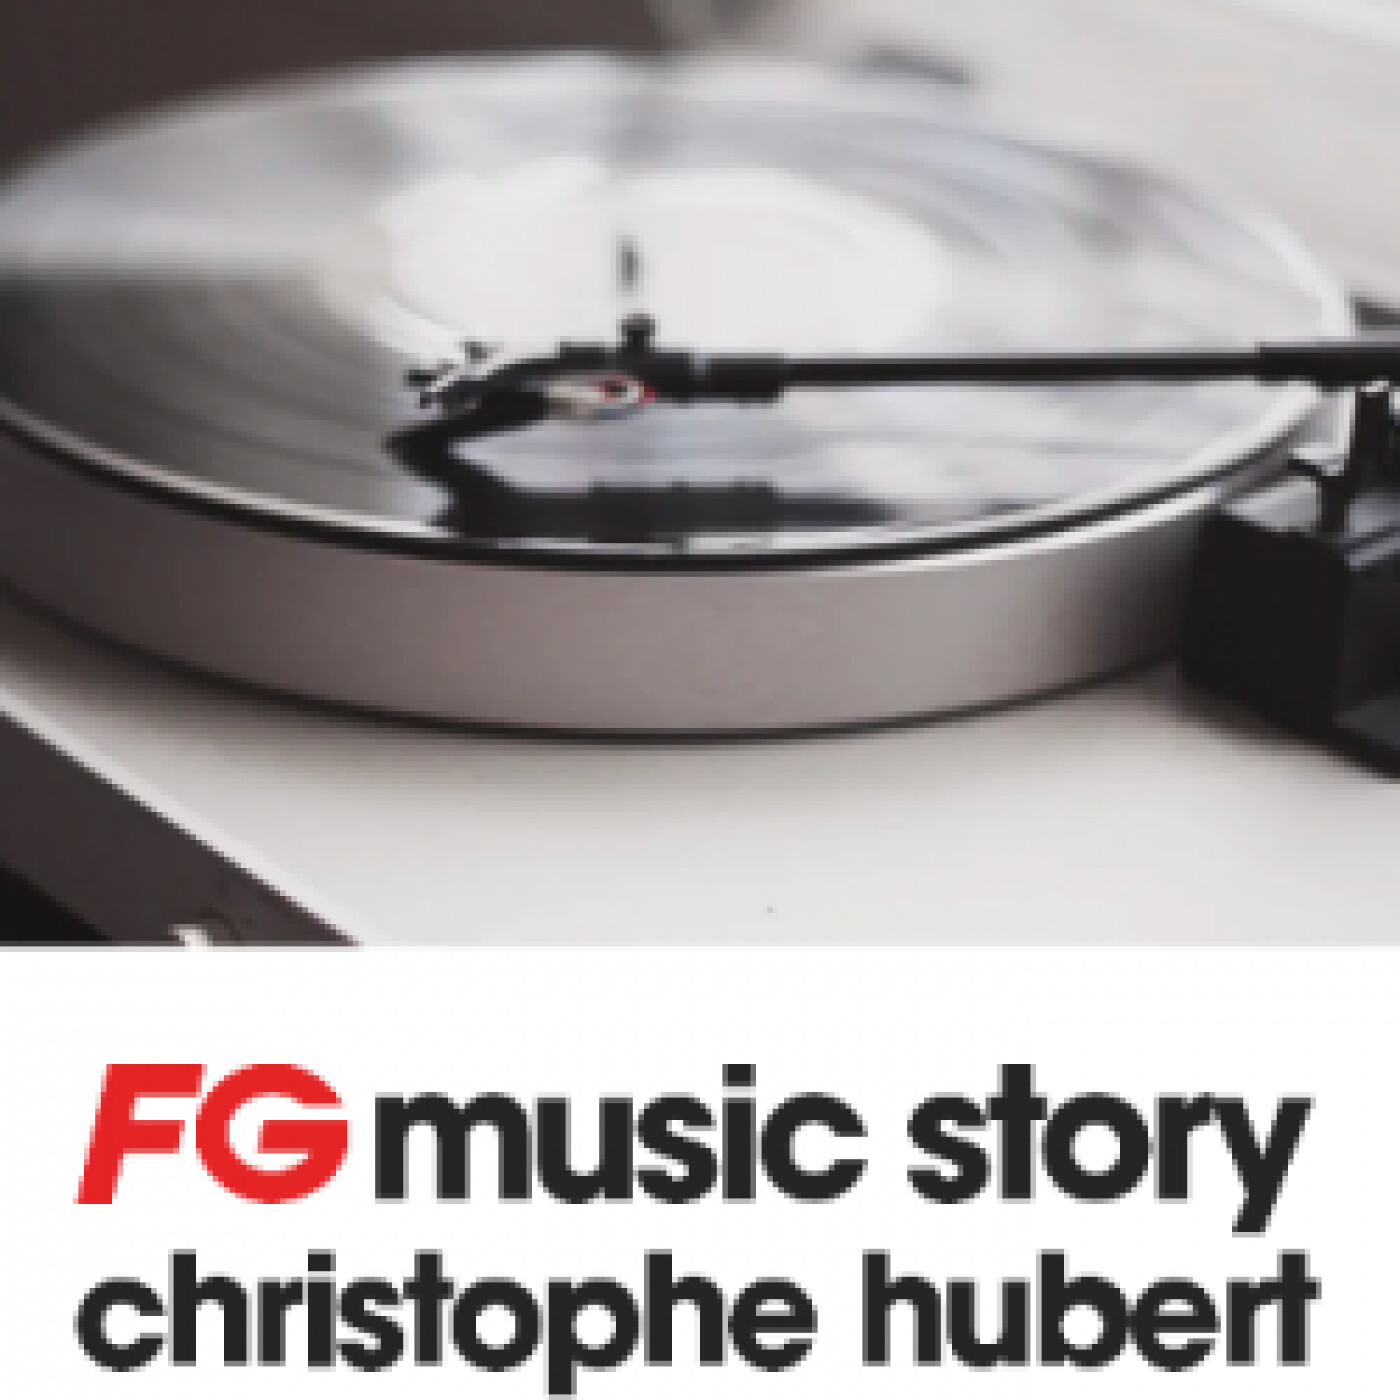 FG MUSIC STORY : AVICII